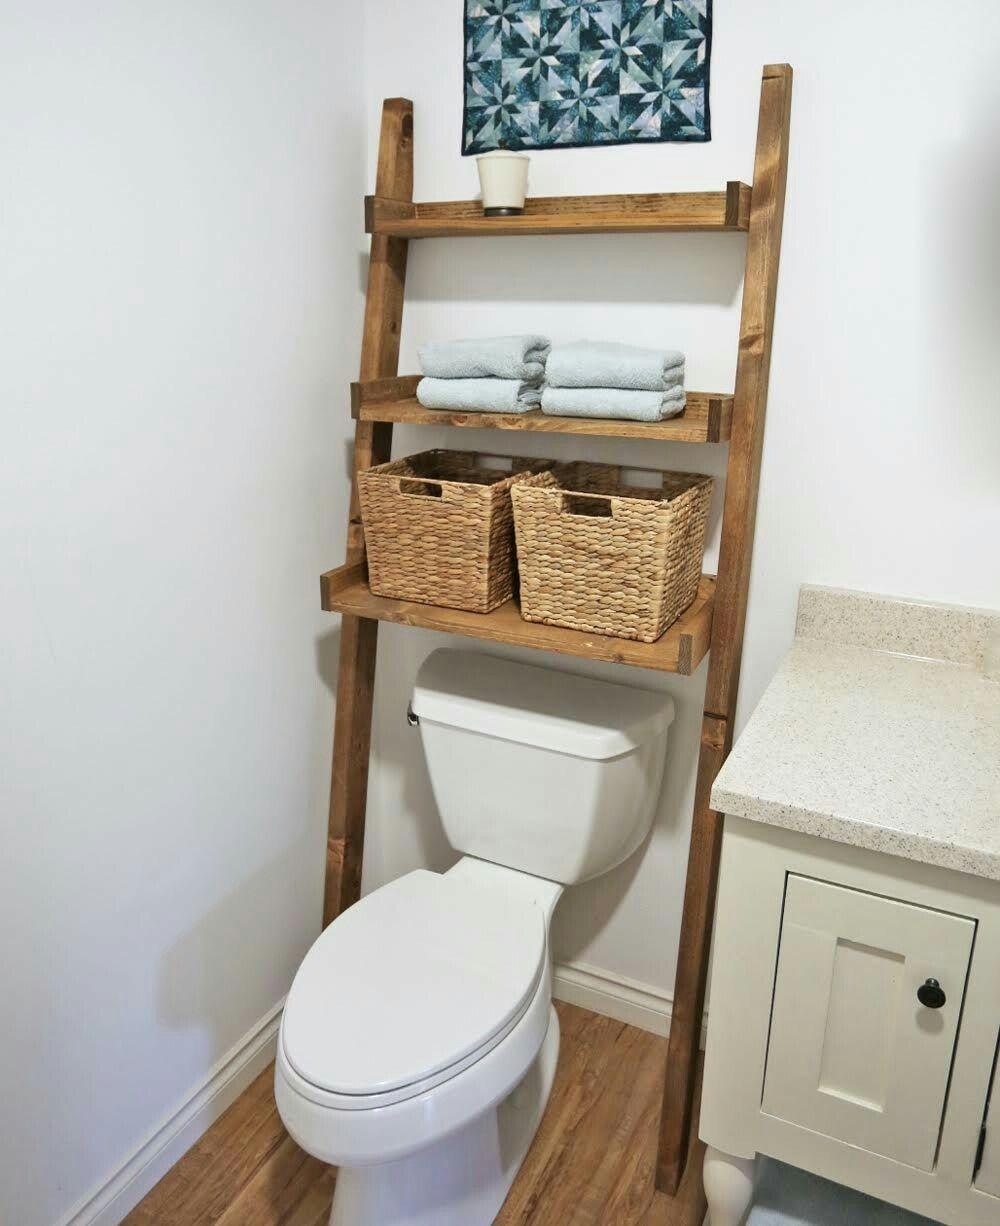 Pin By Jennifer Kosloski On Remodeling Pinterest Bathroom